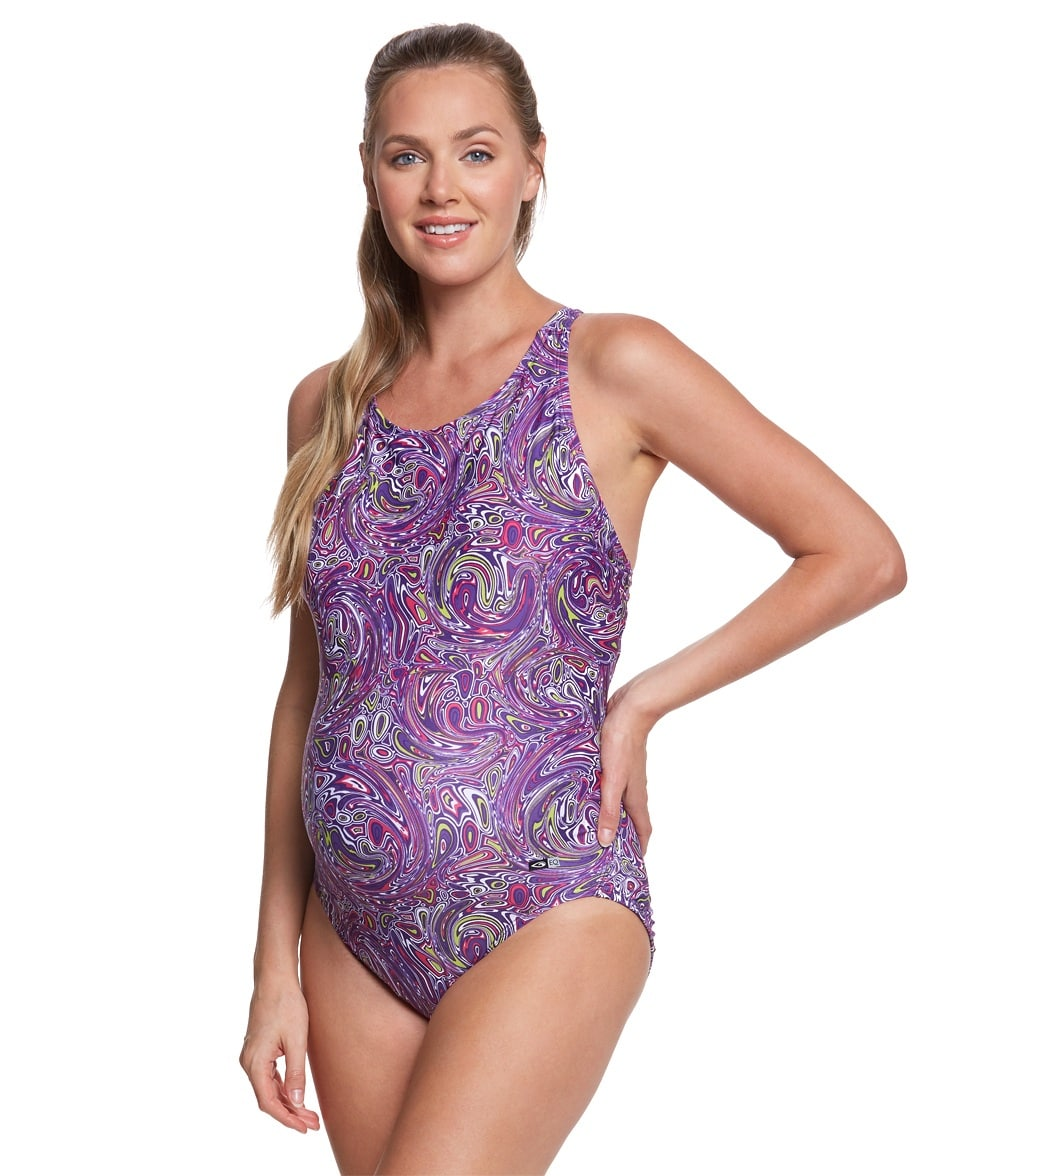 effb45f4b4a03 EQ Swimwear Laguna Maternity Print One Piece at SwimOutlet.com ...